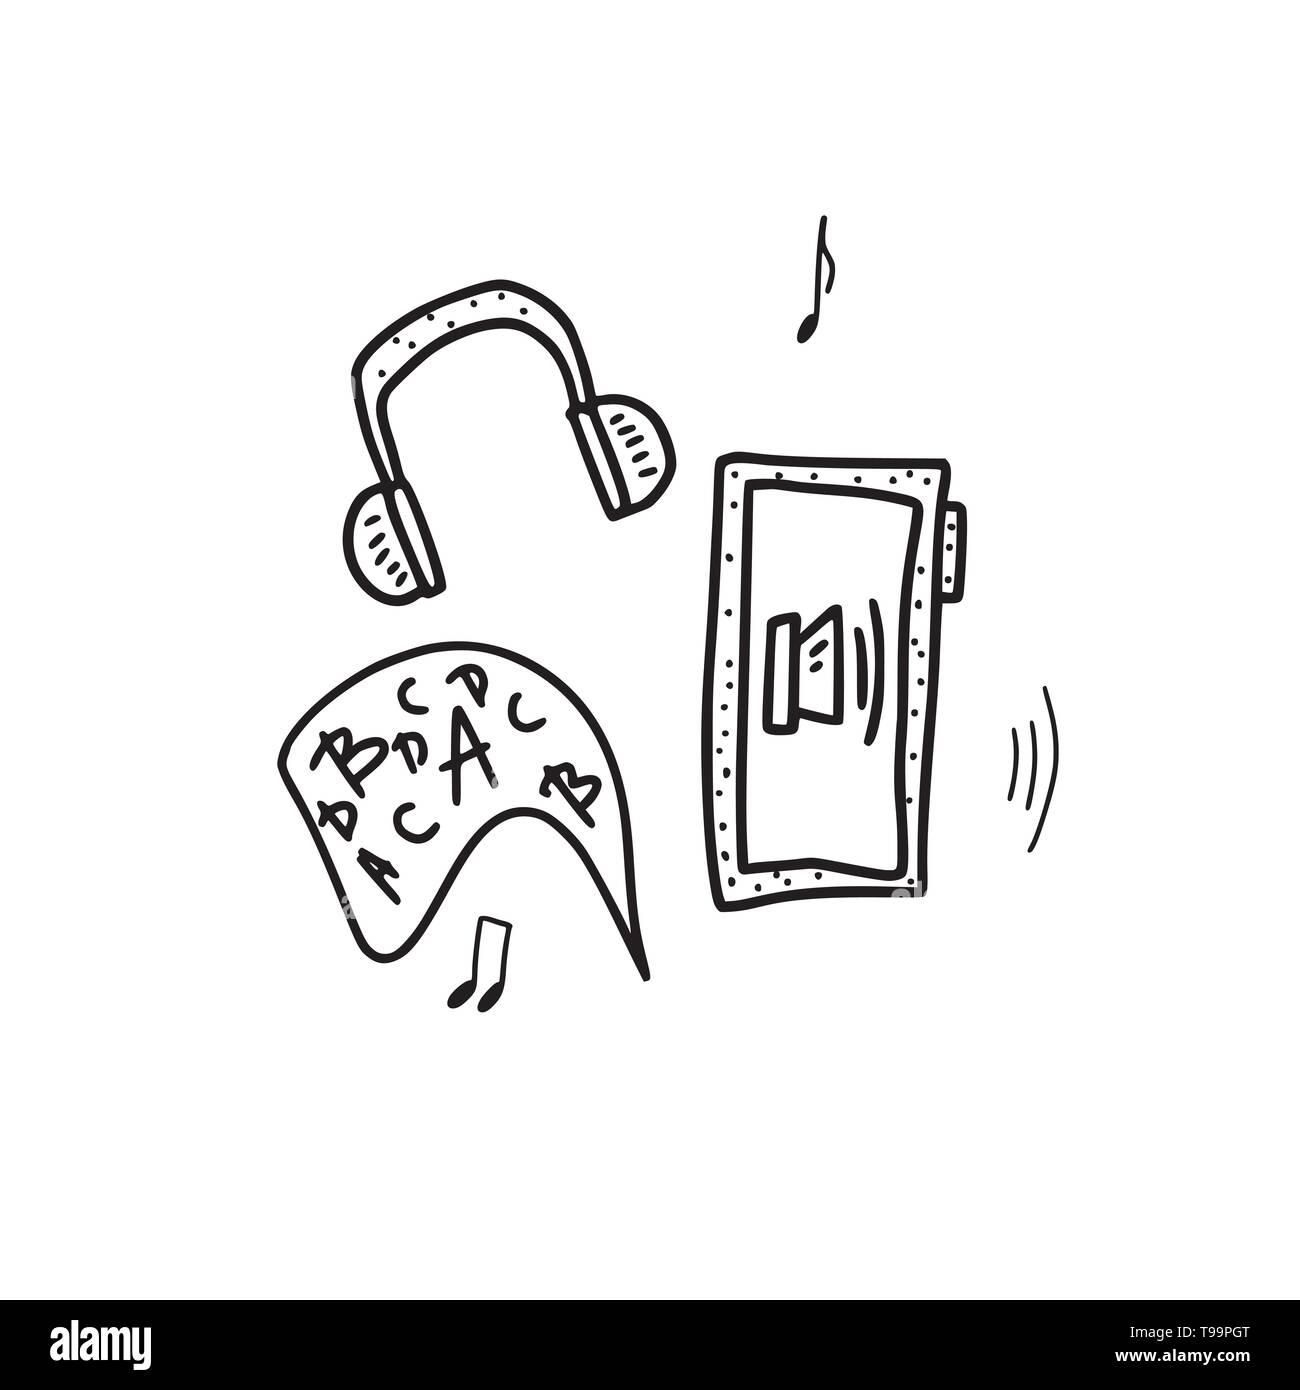 Audiobooks concept. Emblem of audio book symbols. Vector illustration. Stock Vector